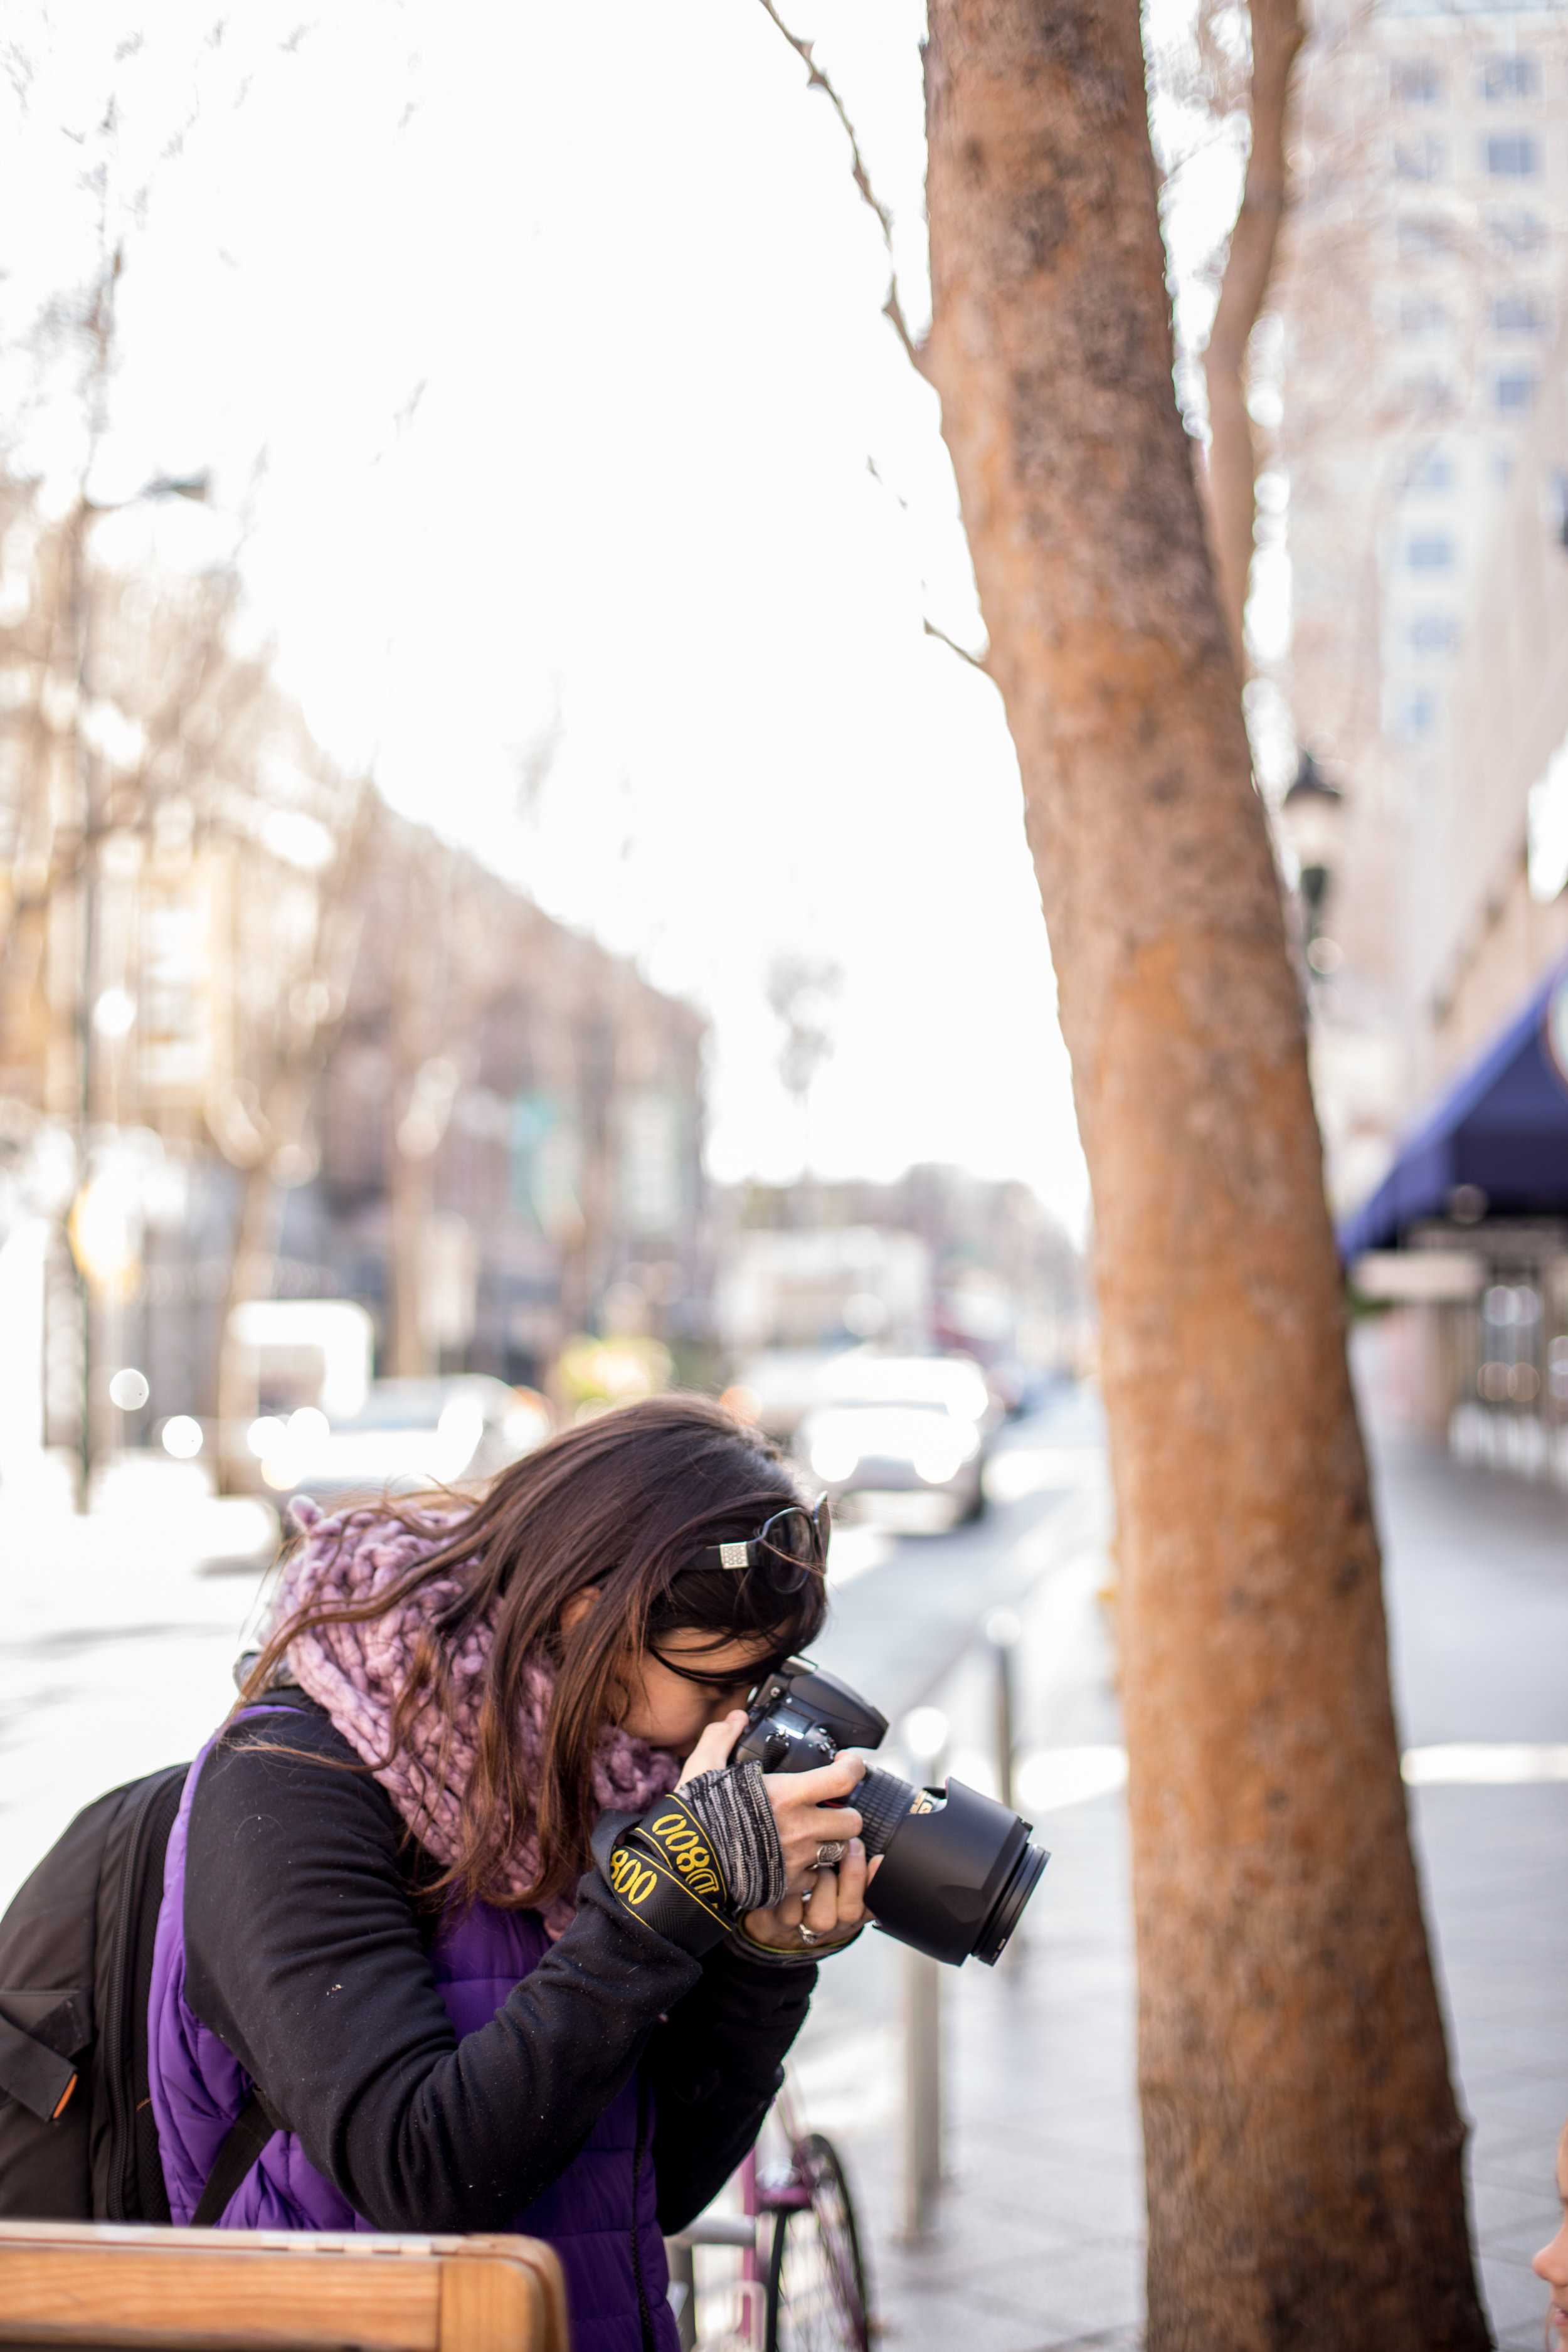 Ewa Samples Photography taking a photo